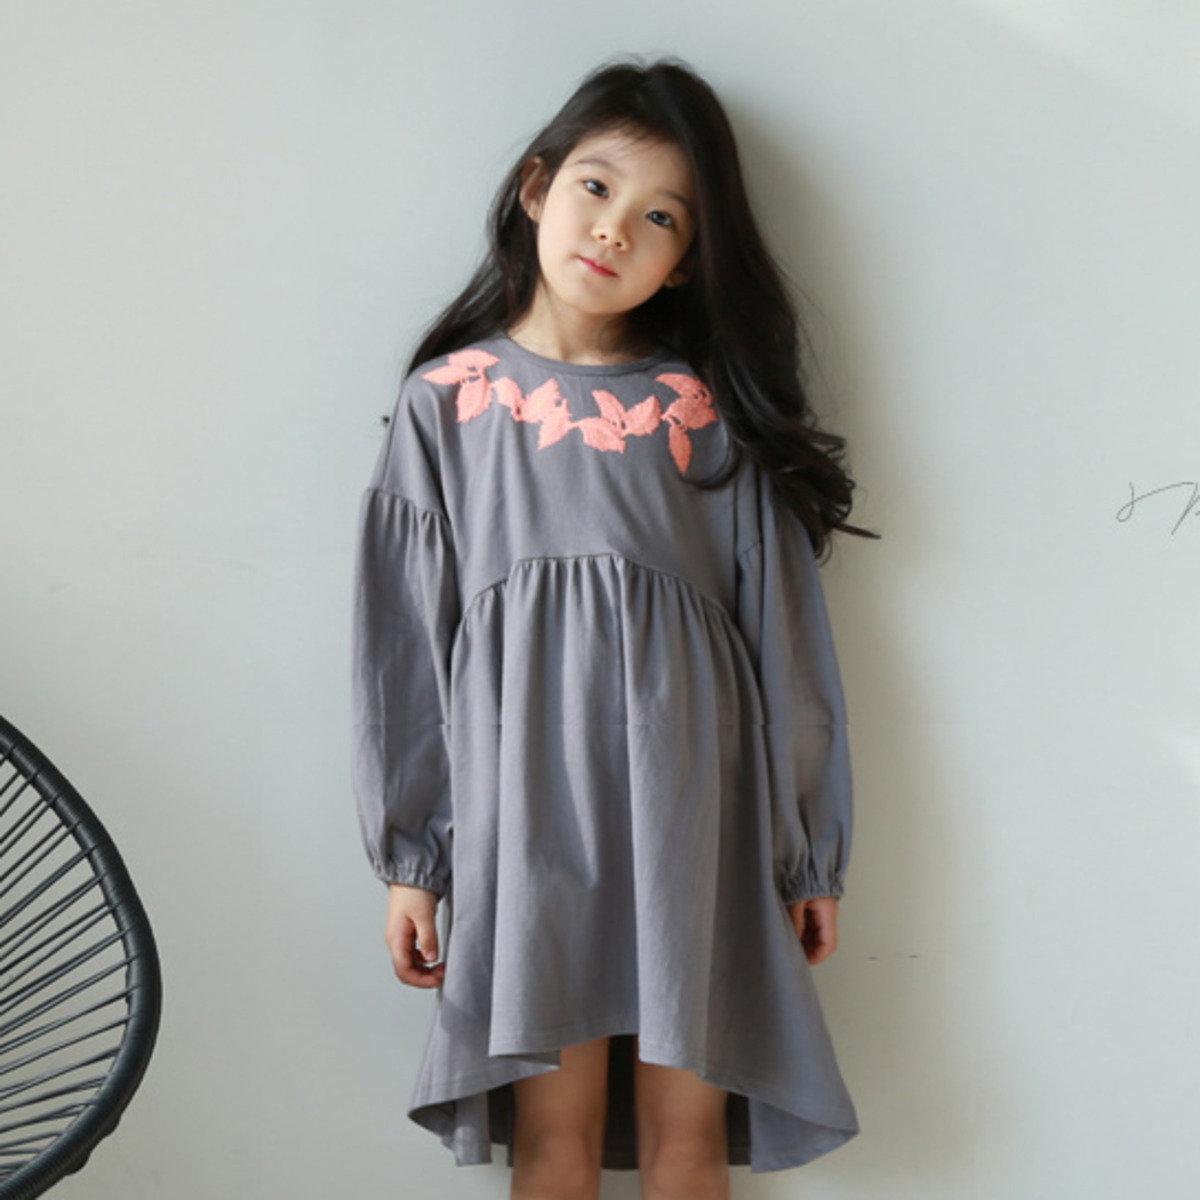 [16 SP] 刺繡圖案高腰裙_S64888